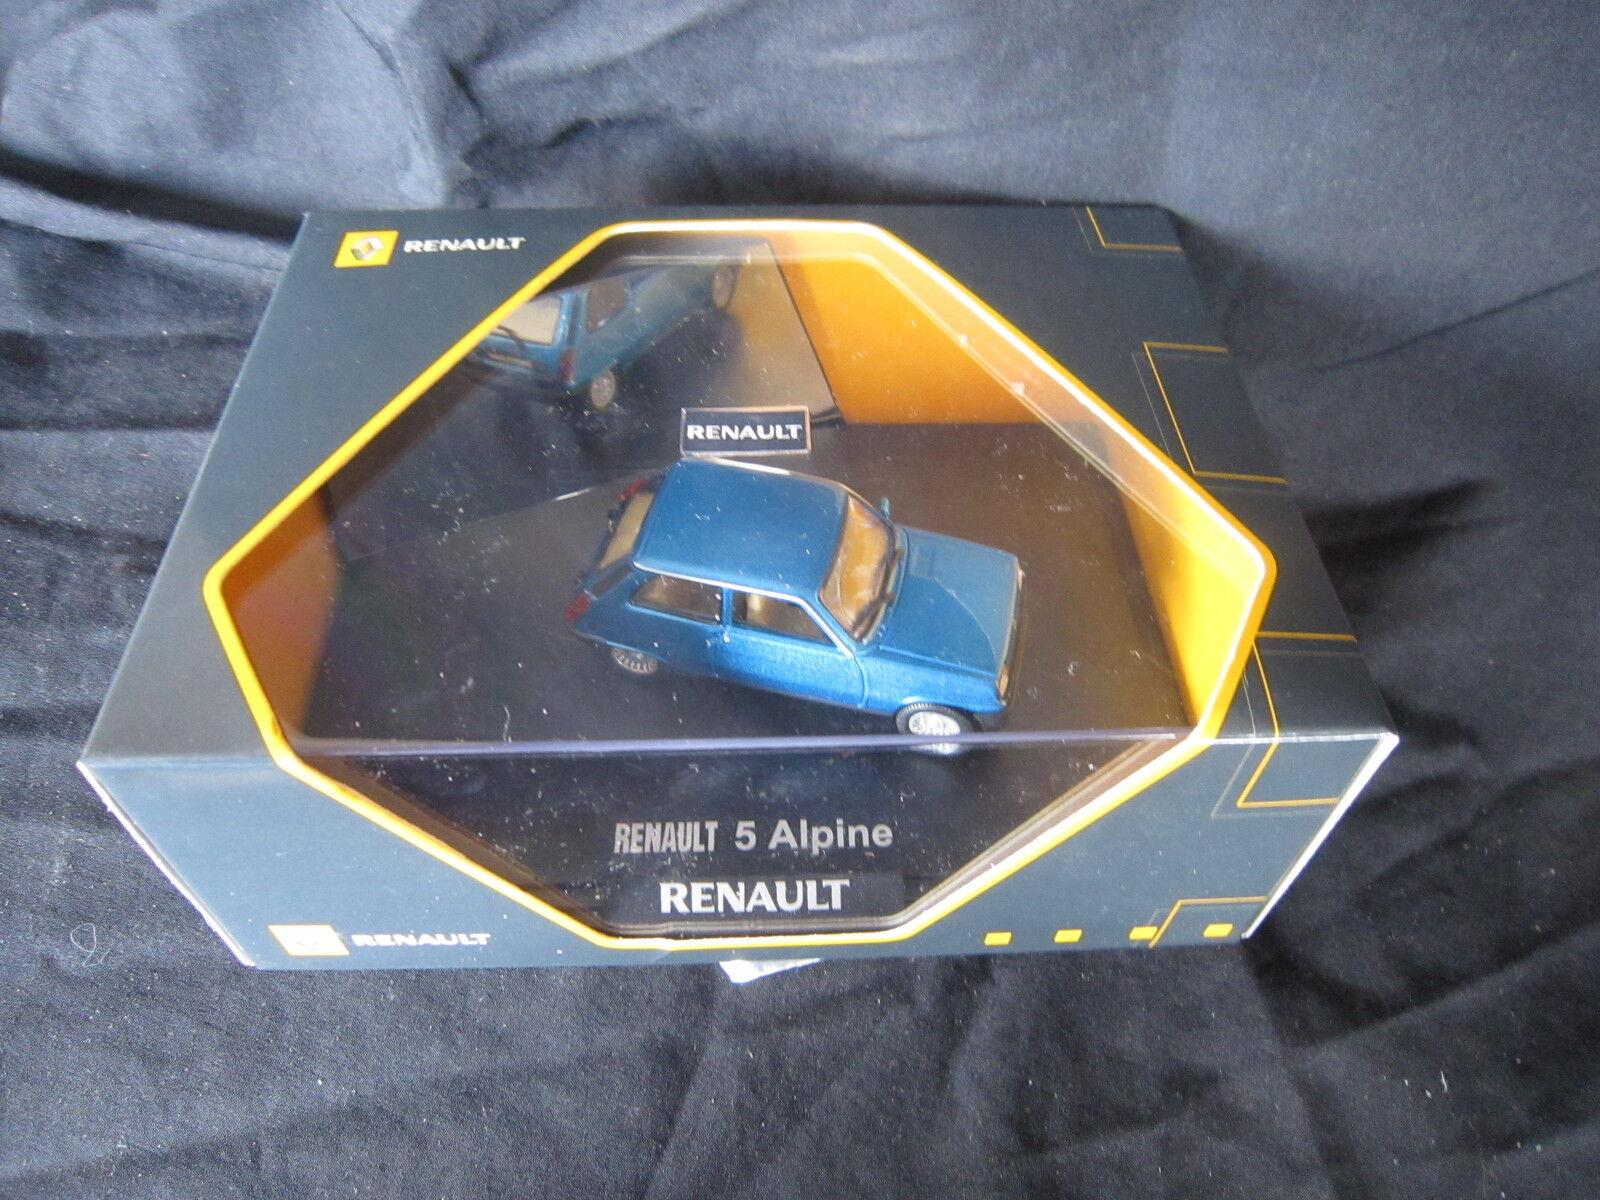 DV6832 NOREV 1 43 RENAULT R5 ALPINE TURBO blu METAL 1982 7711420085 ETAT NEUF